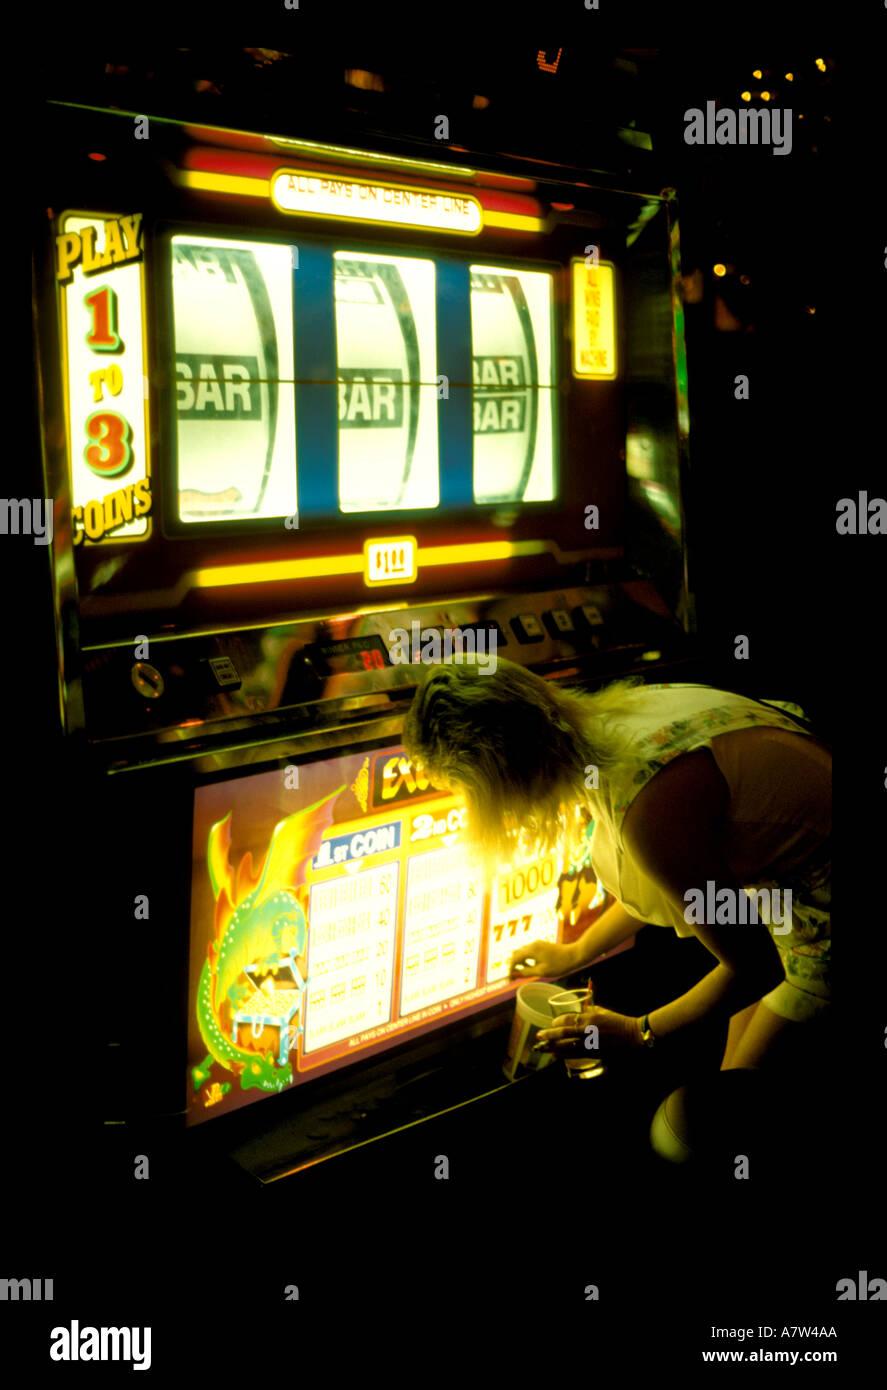 Casino jeu paris